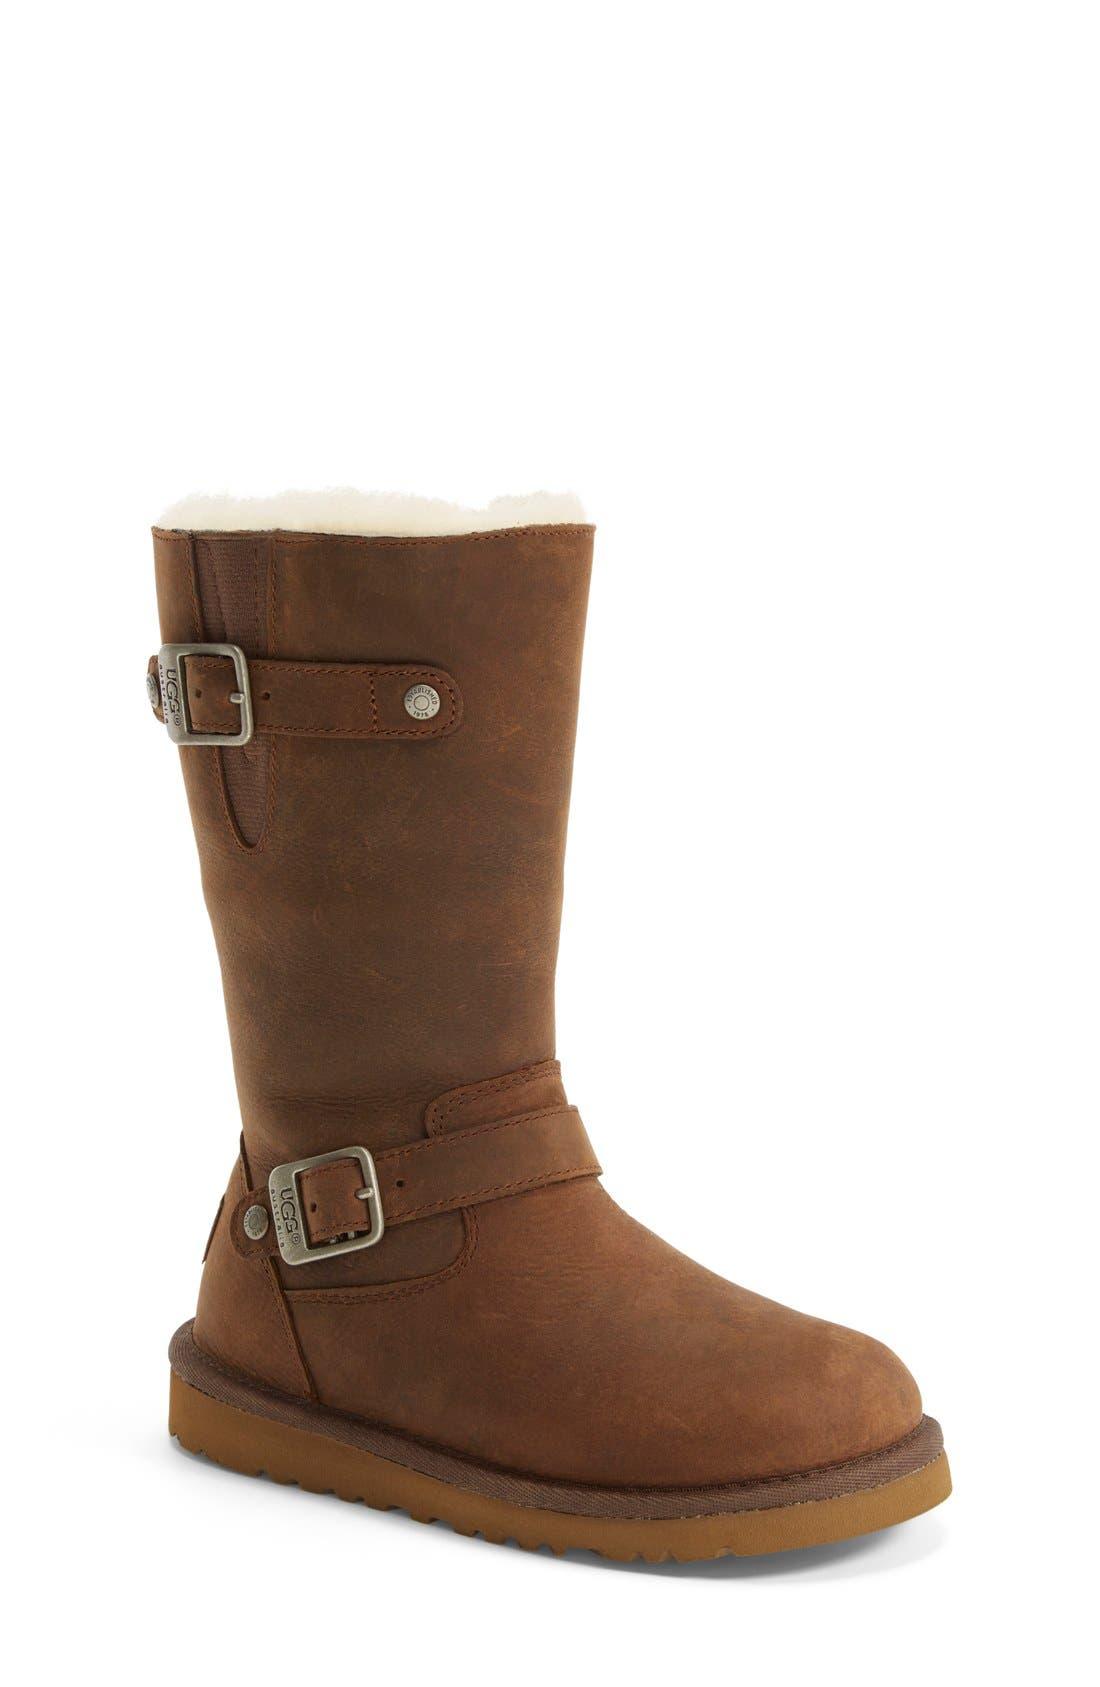 Main Image - UGG® 'Kensington' Boot (Toddler, Little Kid & Big Kid)